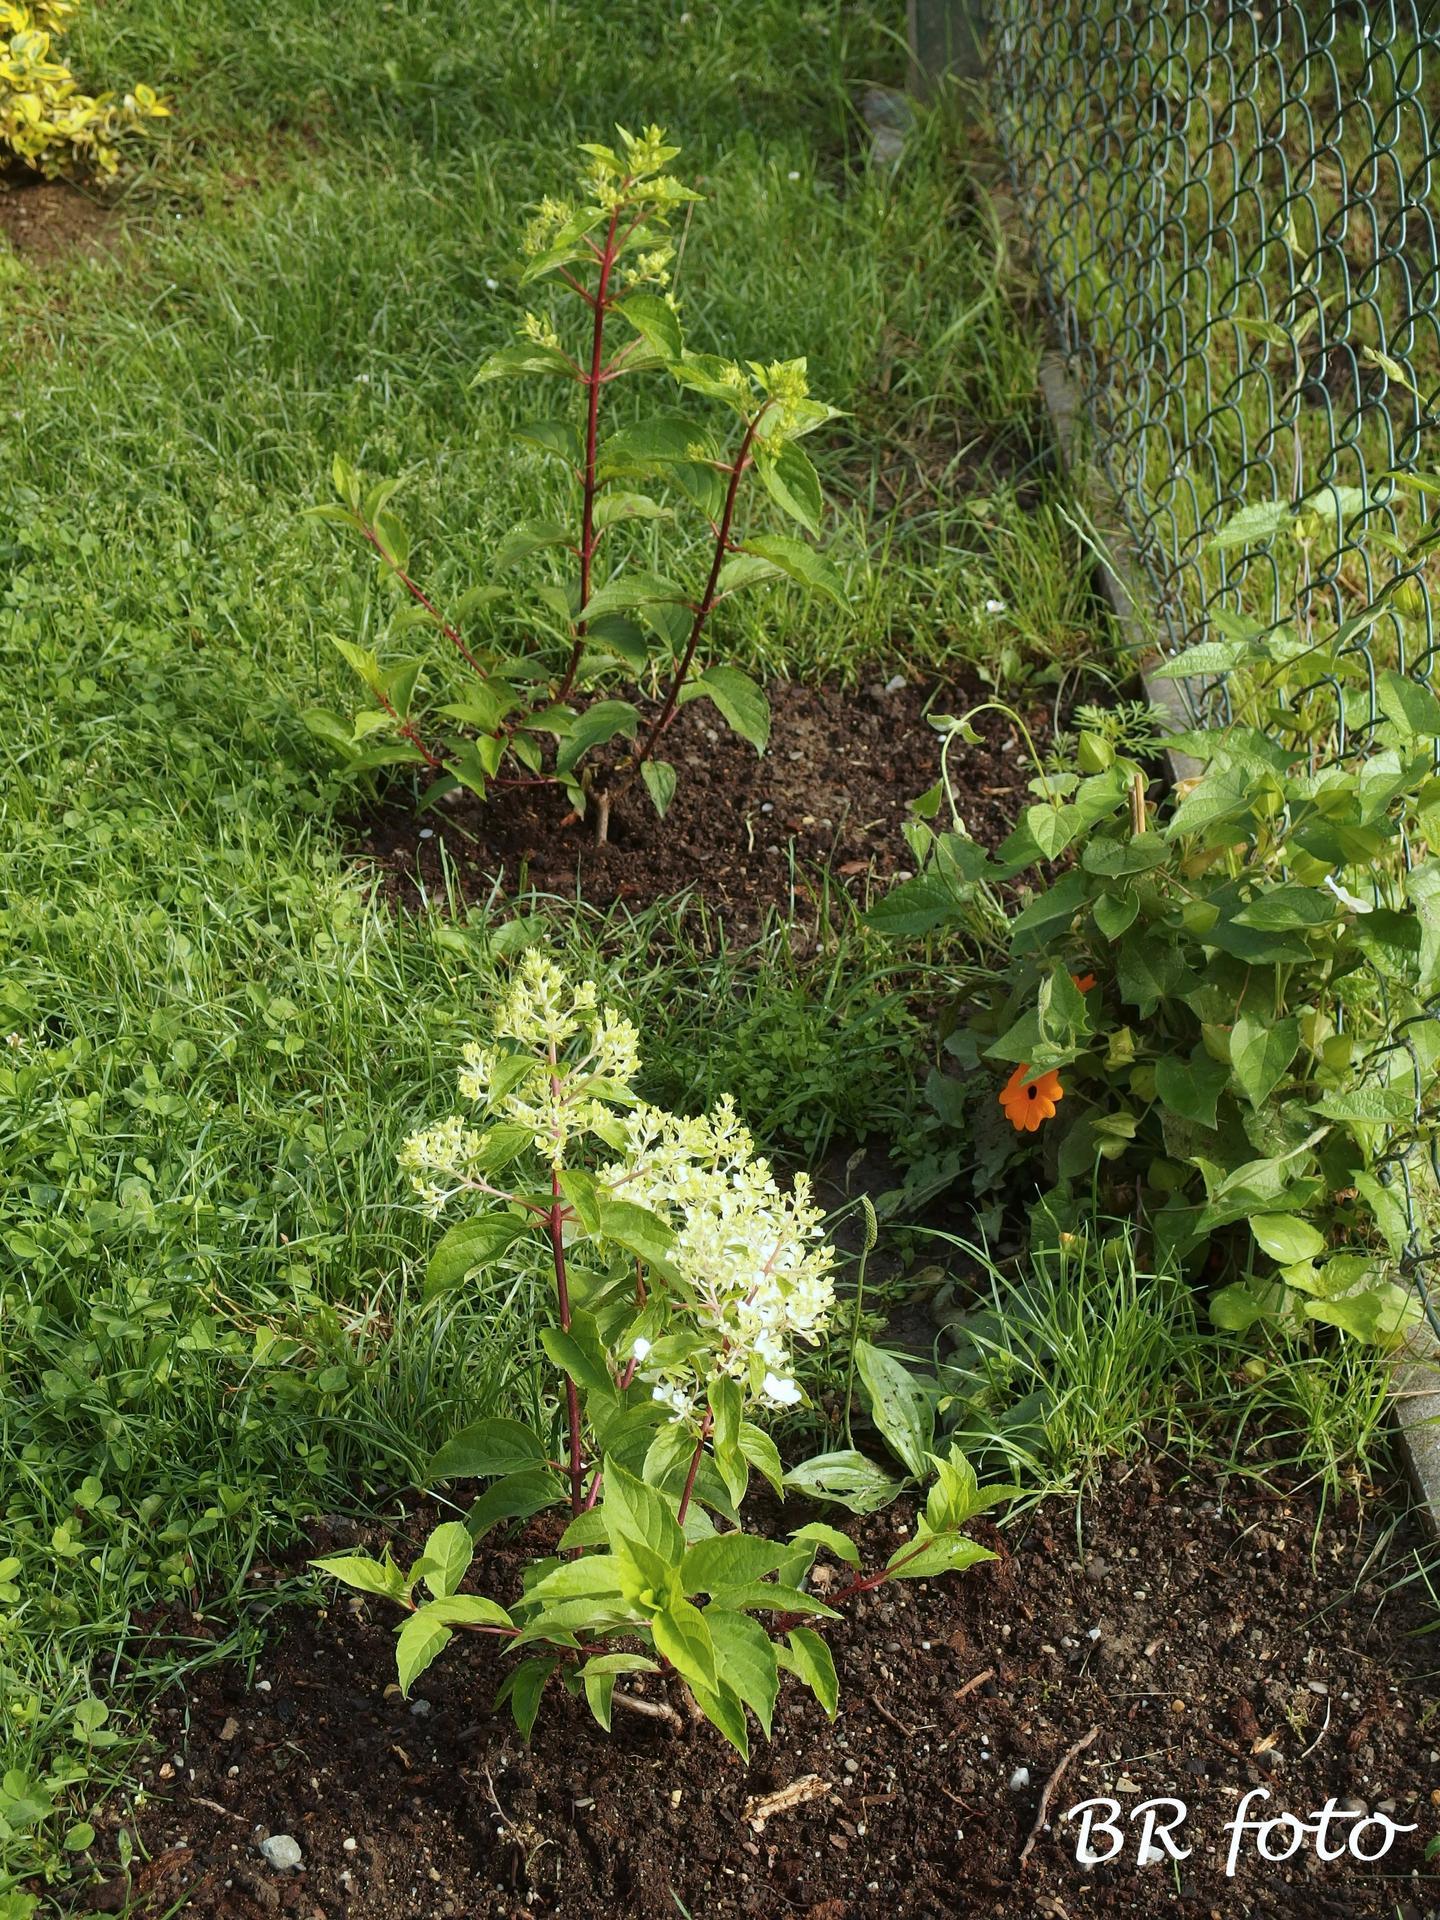 Zahrada v červnu - vše roste a kvete jako o život.... - nově vysazené hortenzie latnaté